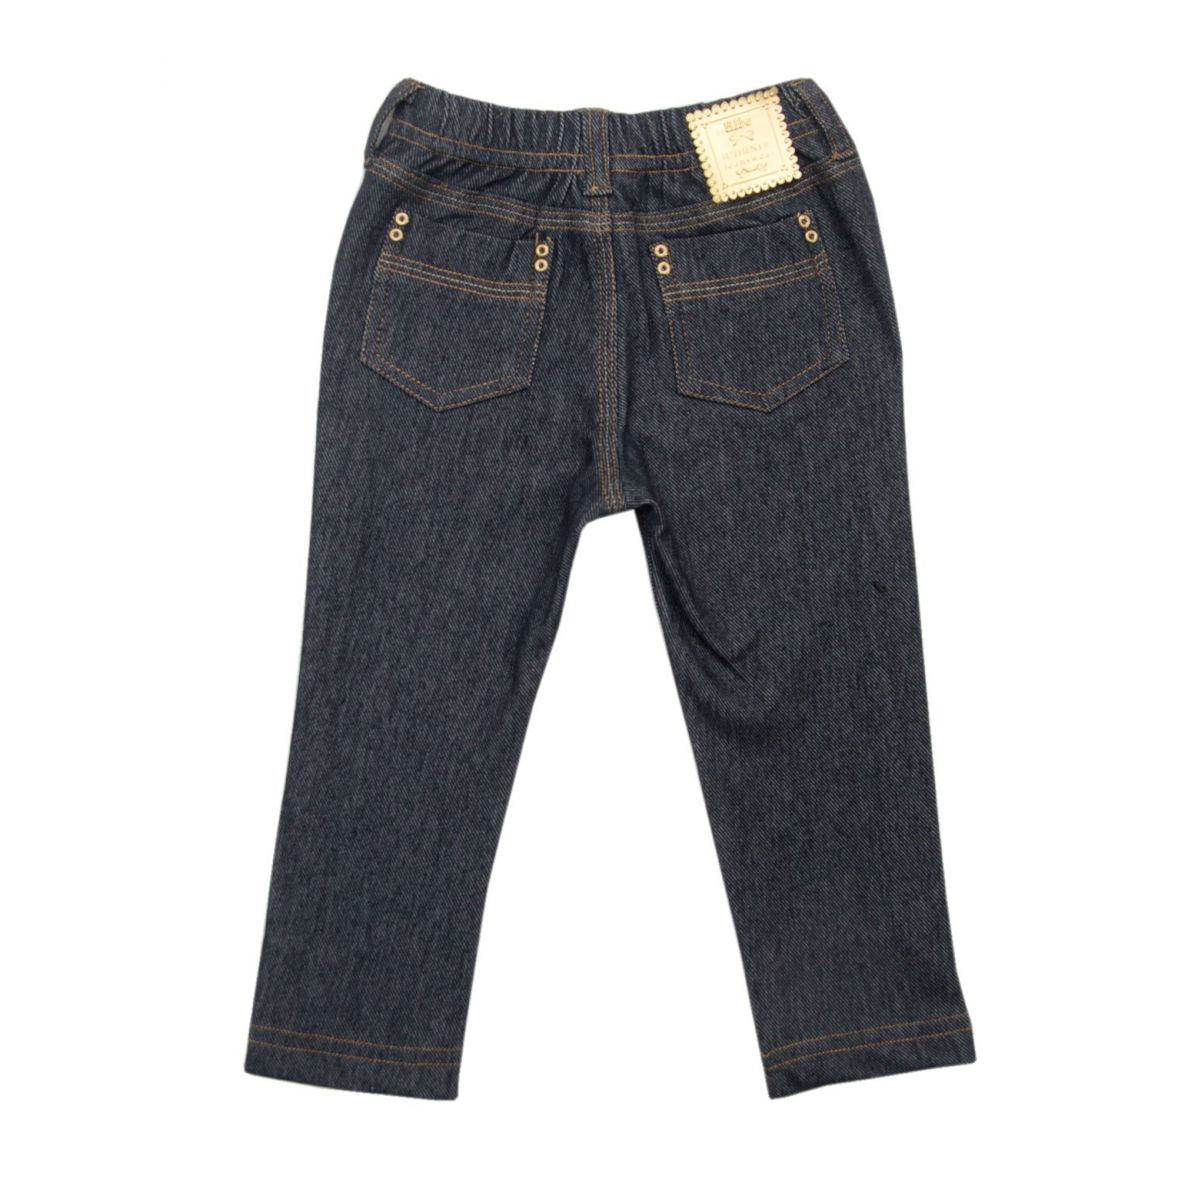 Calça Jeans Feminina Skinny Jeans Blue Comfort Denim Bebê